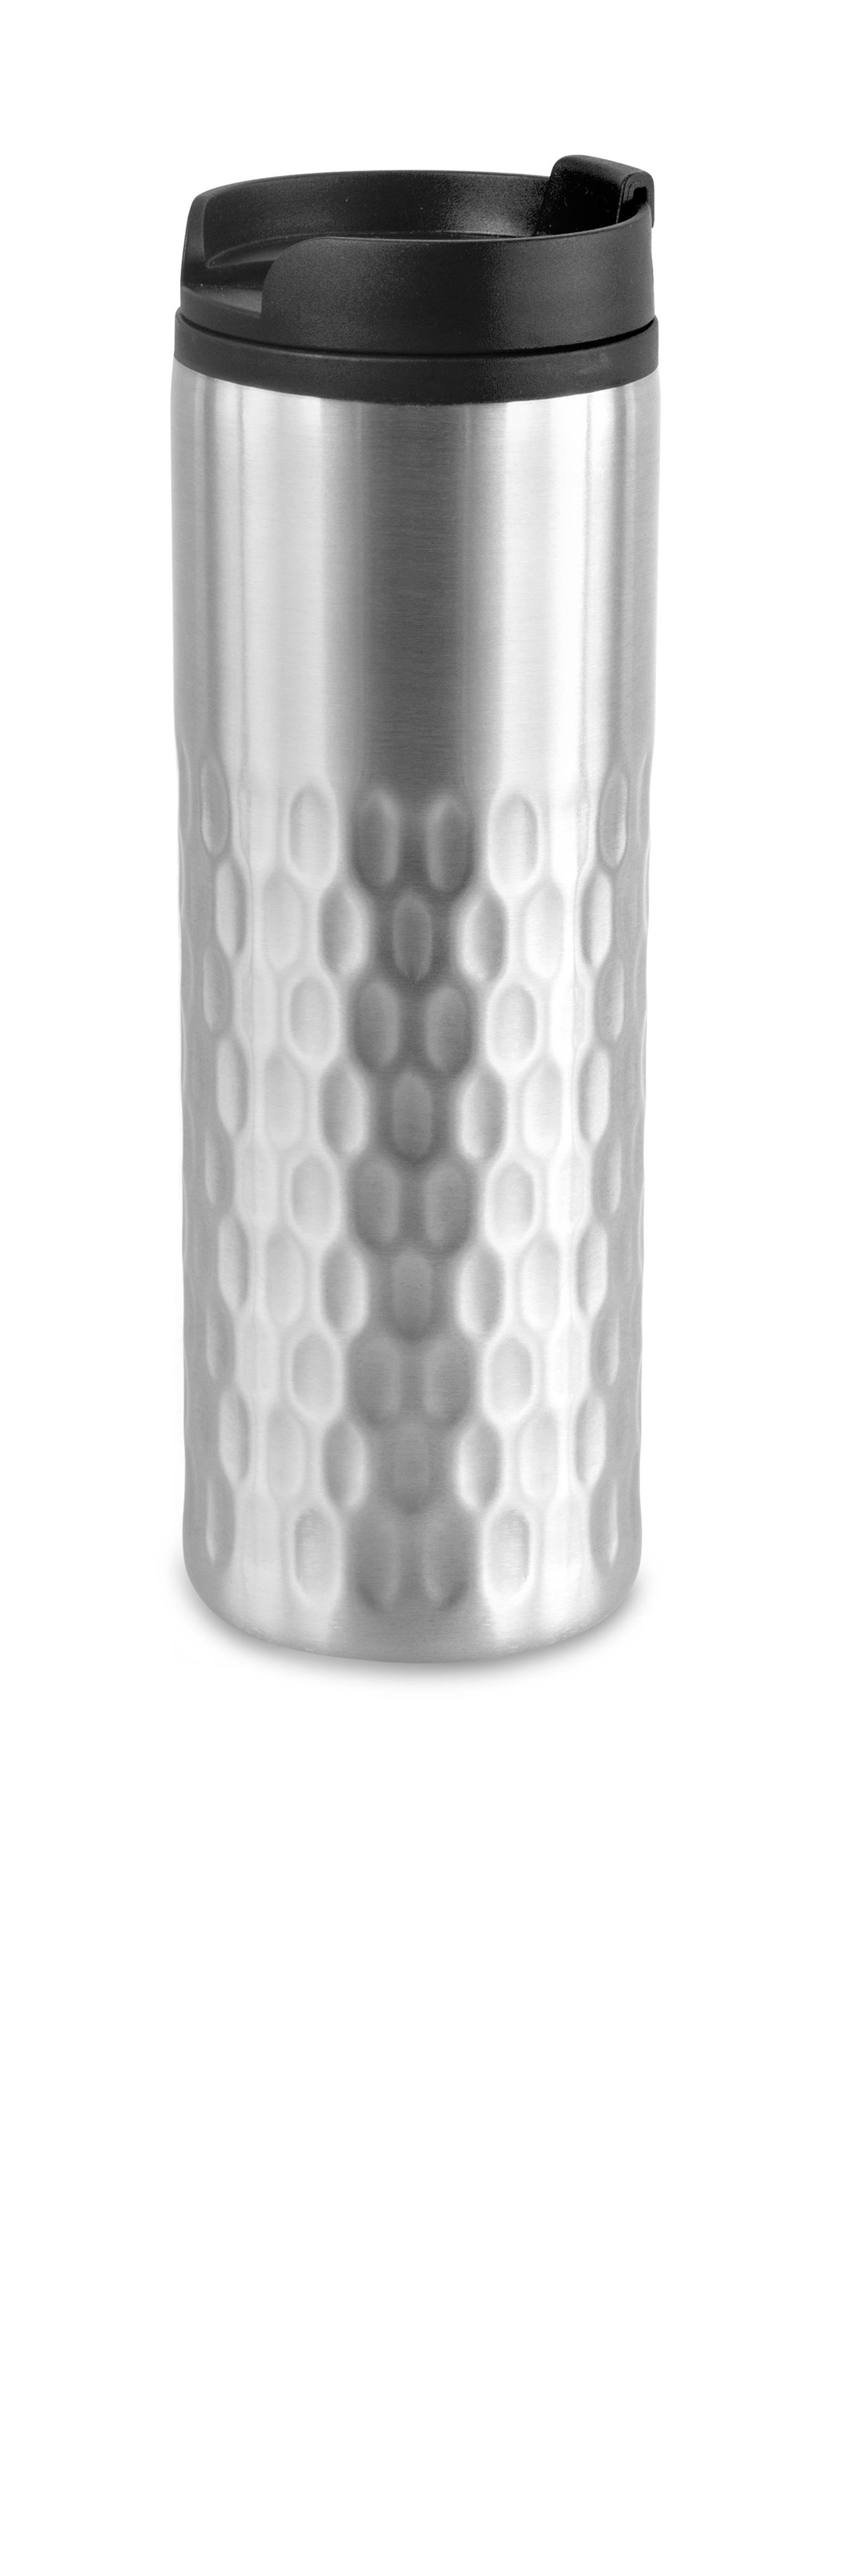 Honeycomb Mug - 470ml